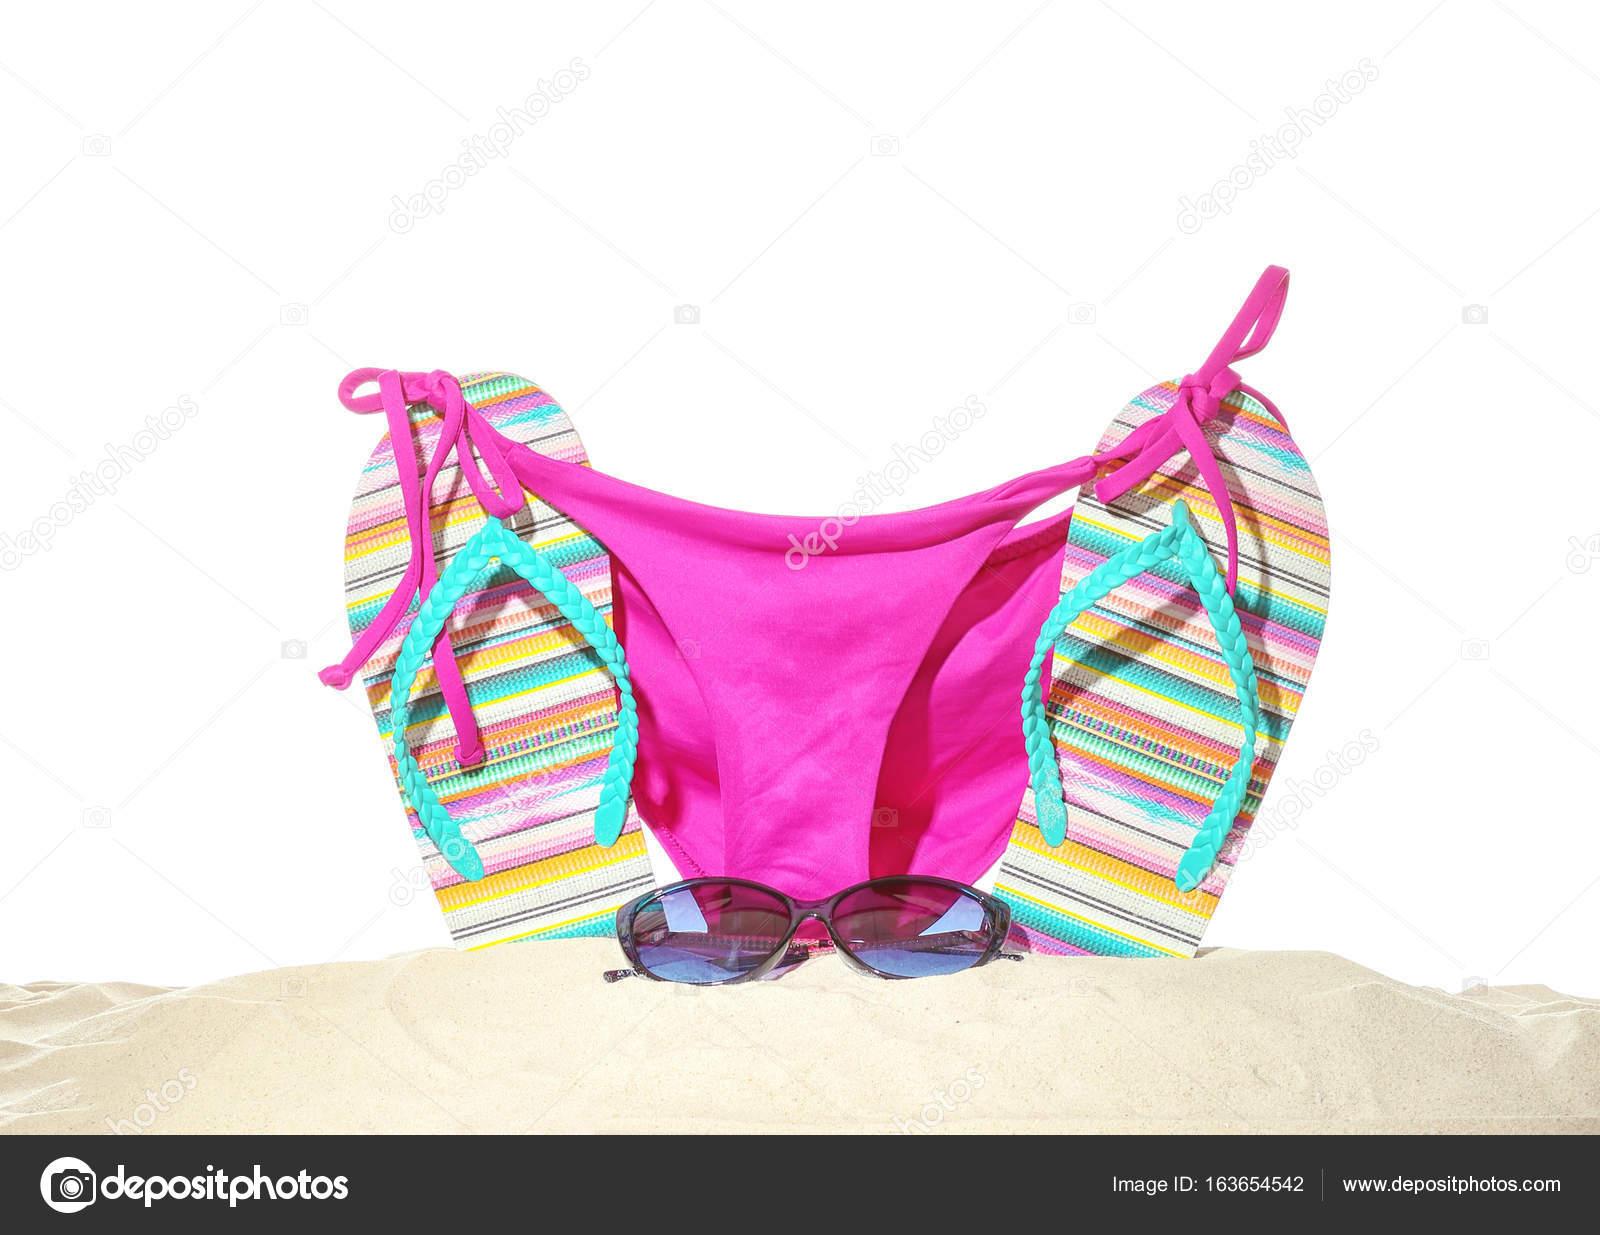 Shaking, support. bikini flip flops